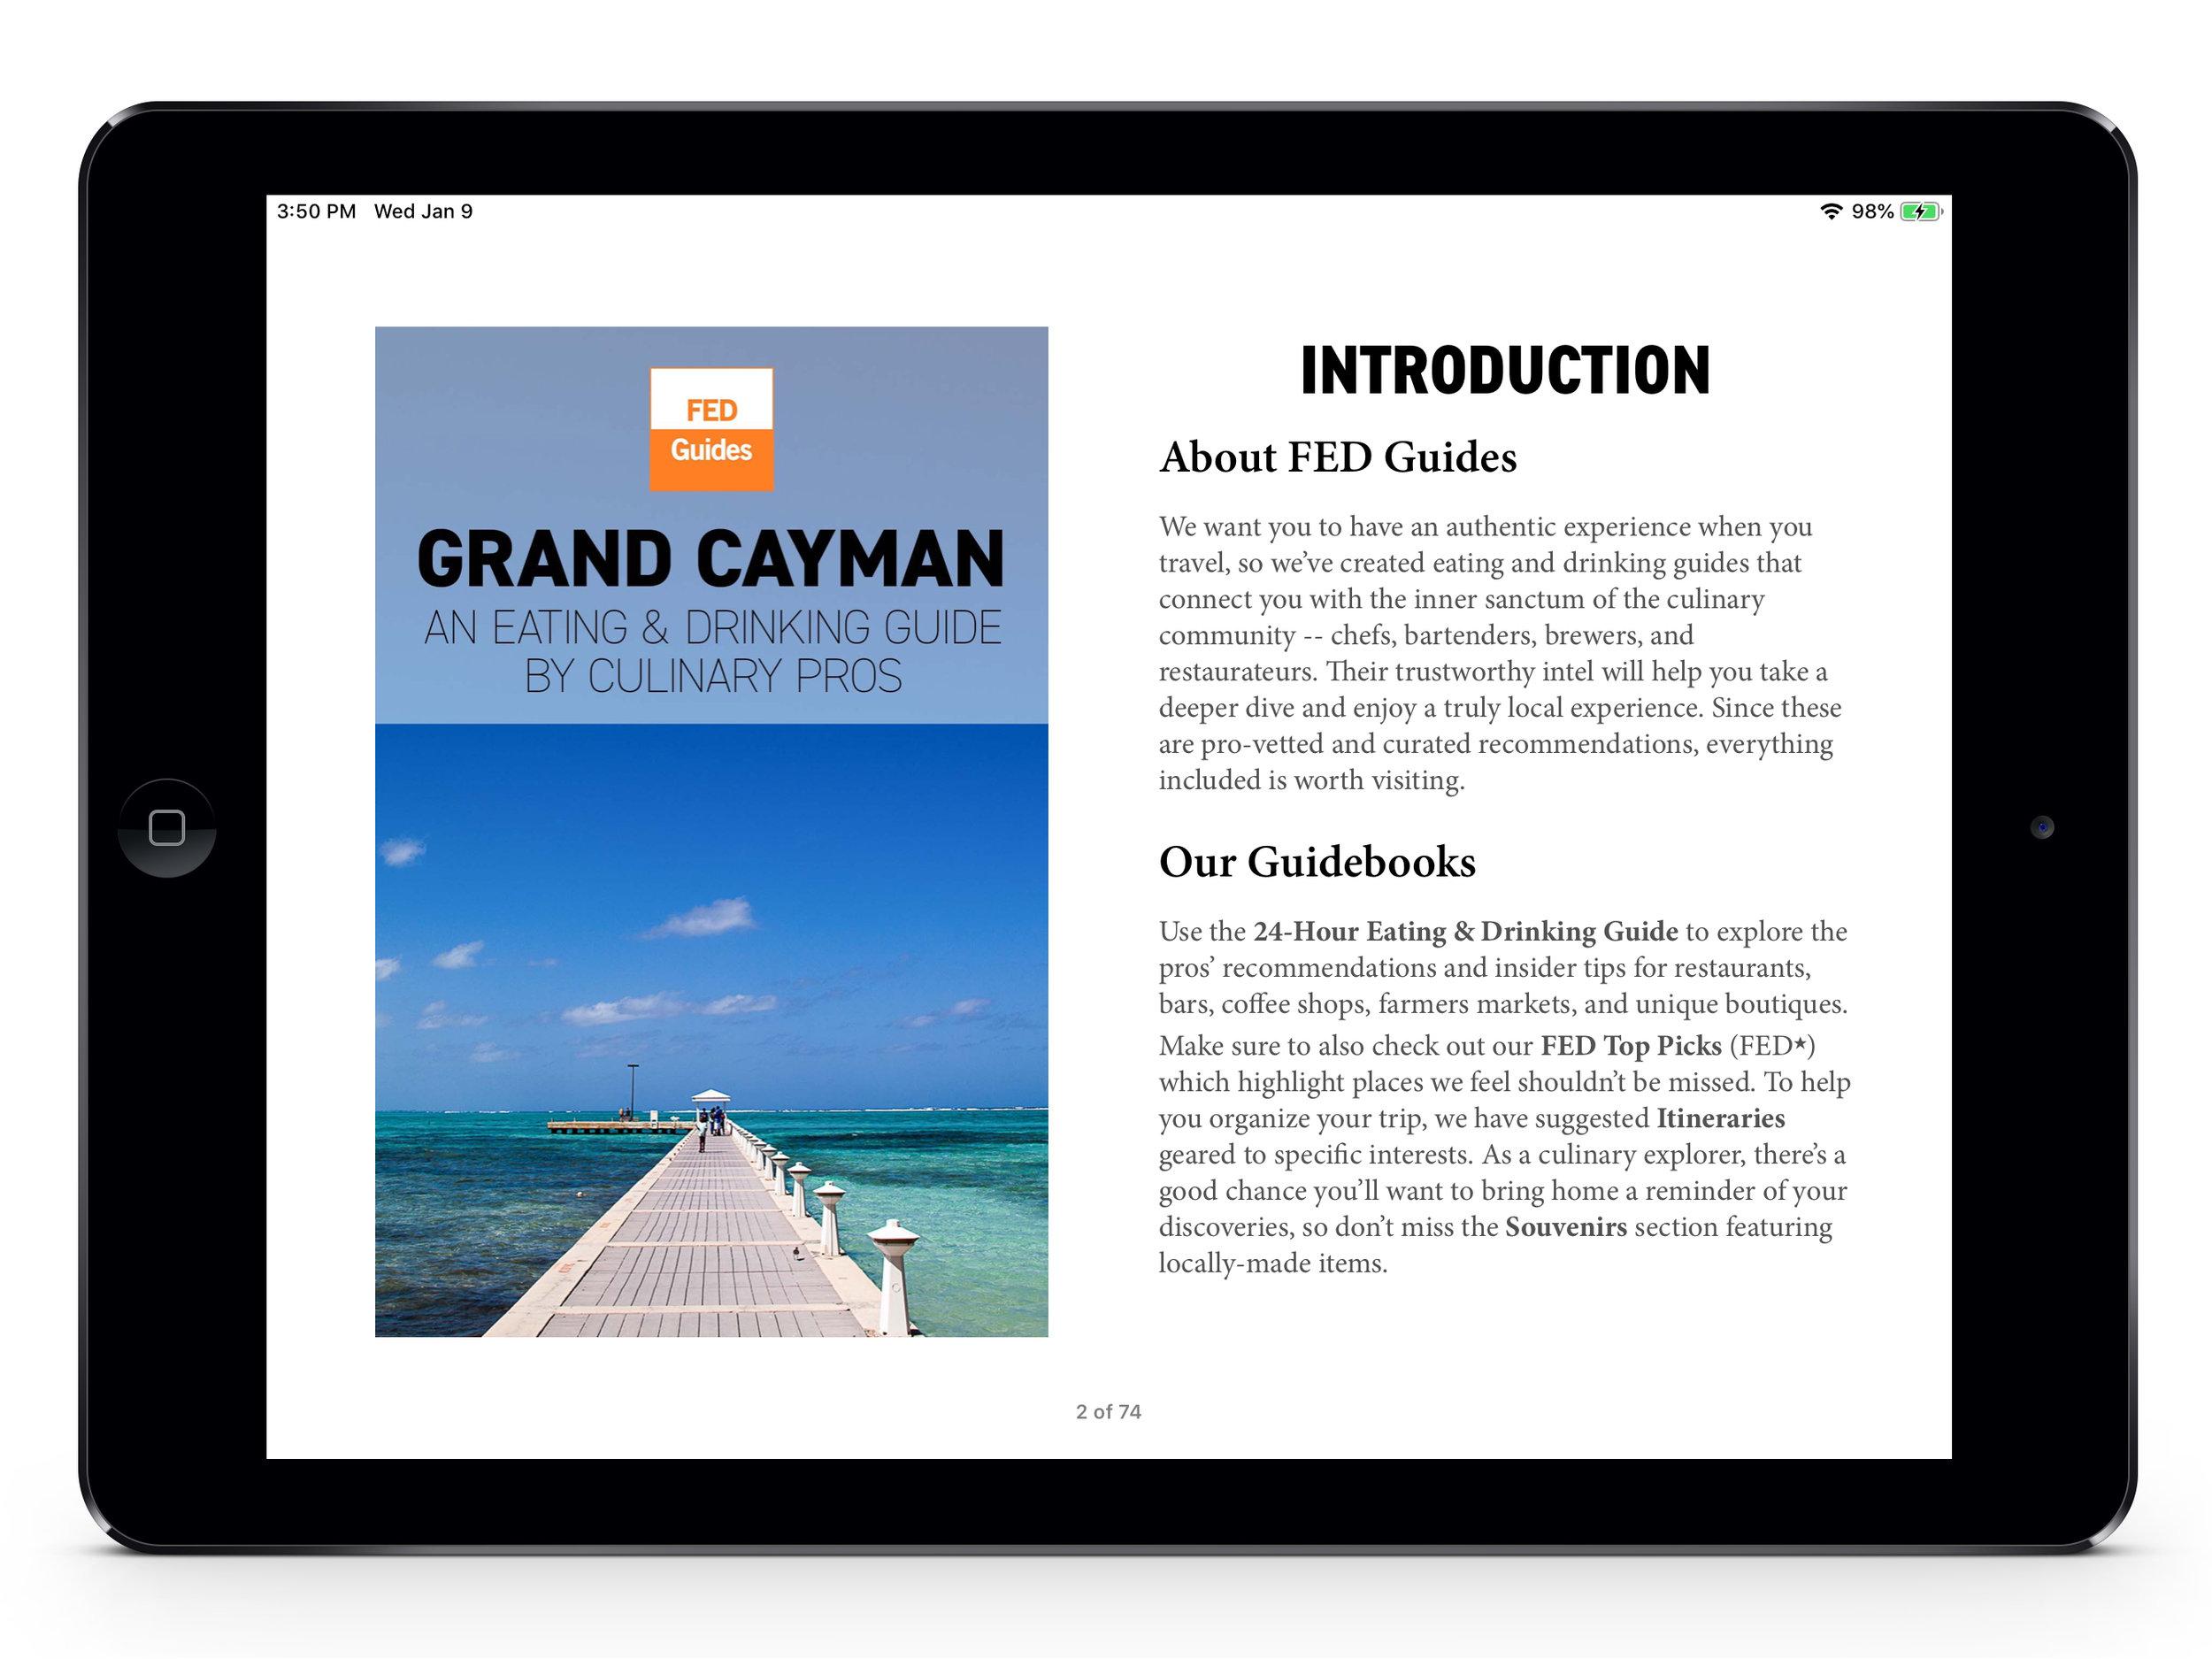 iPadAir_GrandCayman_Screenshots_Landscape_1.1.jpg